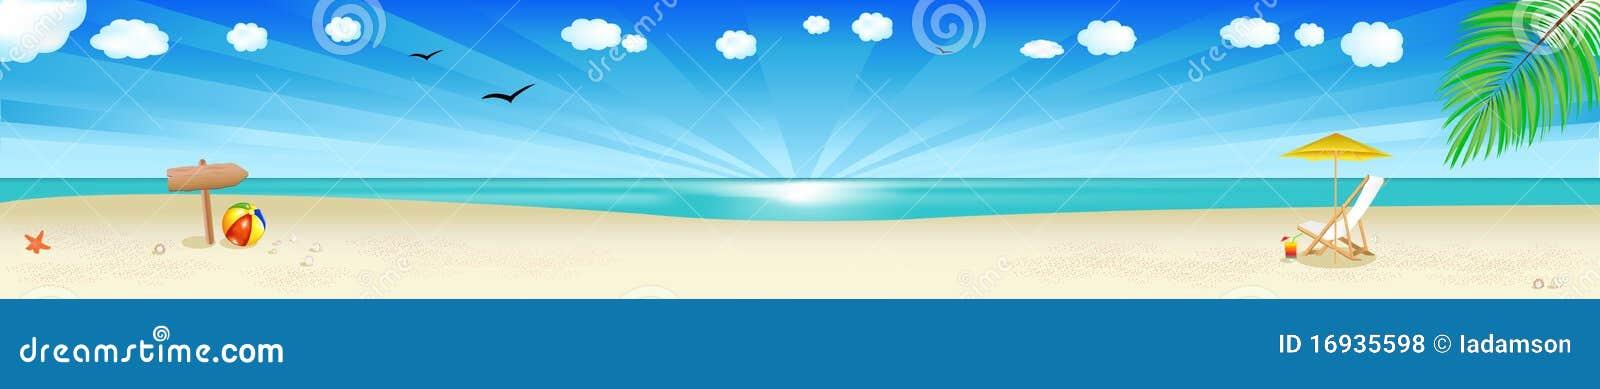 вектор пляжа знамени